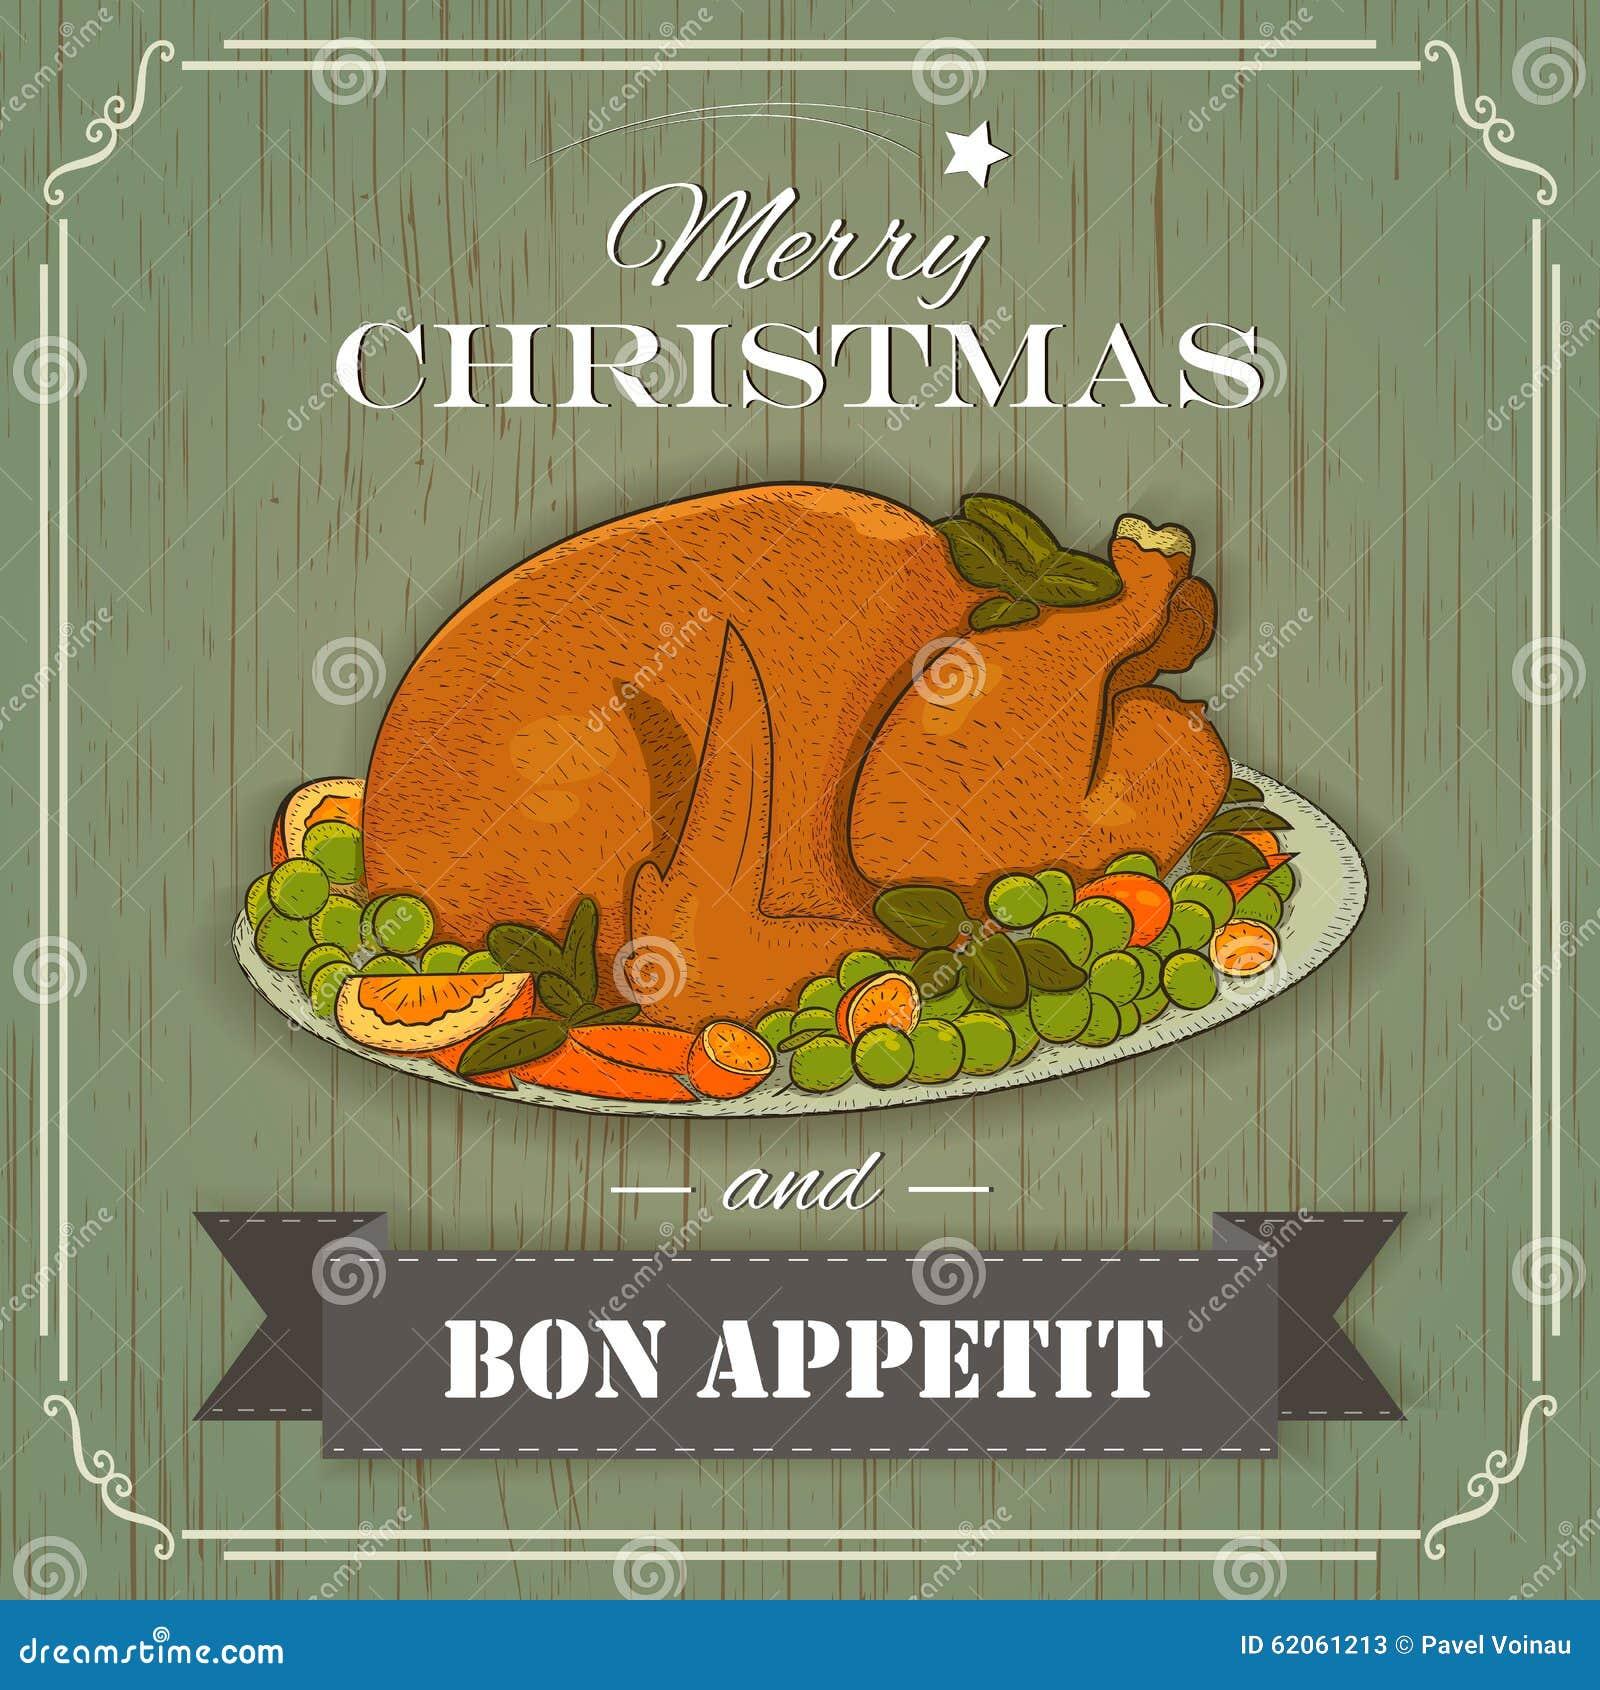 Christmas Turkey Vintage Stock Illustration Image 62061213 : christmas turkey vintage style rrestaurants cafe menu 62061213 from www.dreamstime.com size 1300 x 1390 jpeg 264kB